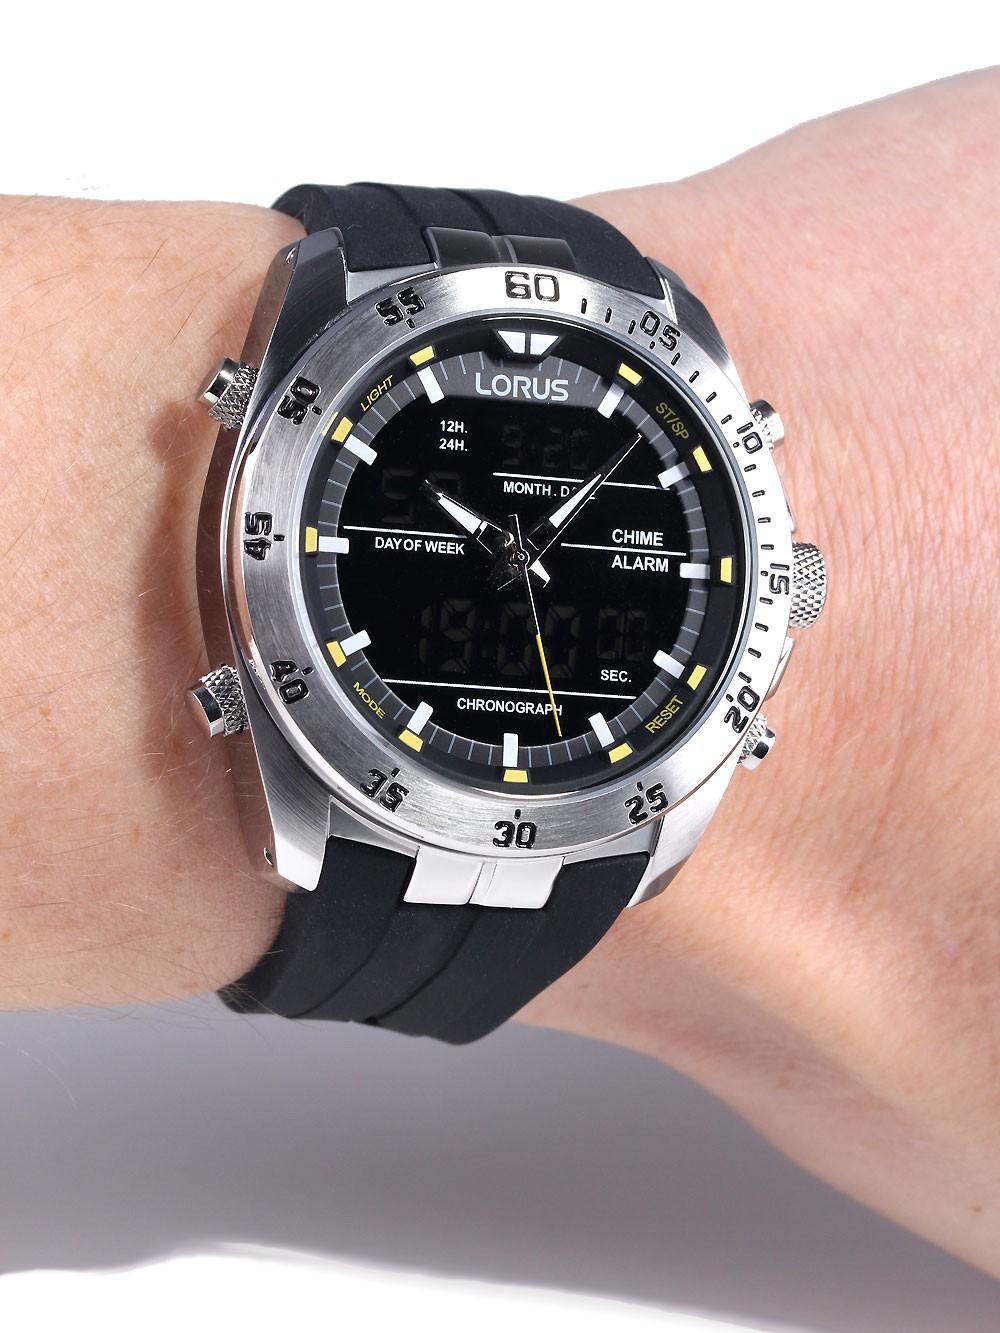 e2d6c9693 Watches | Chrono12 - Lorus RW619AX9 Analog-Digital Alarm Chronograph ...